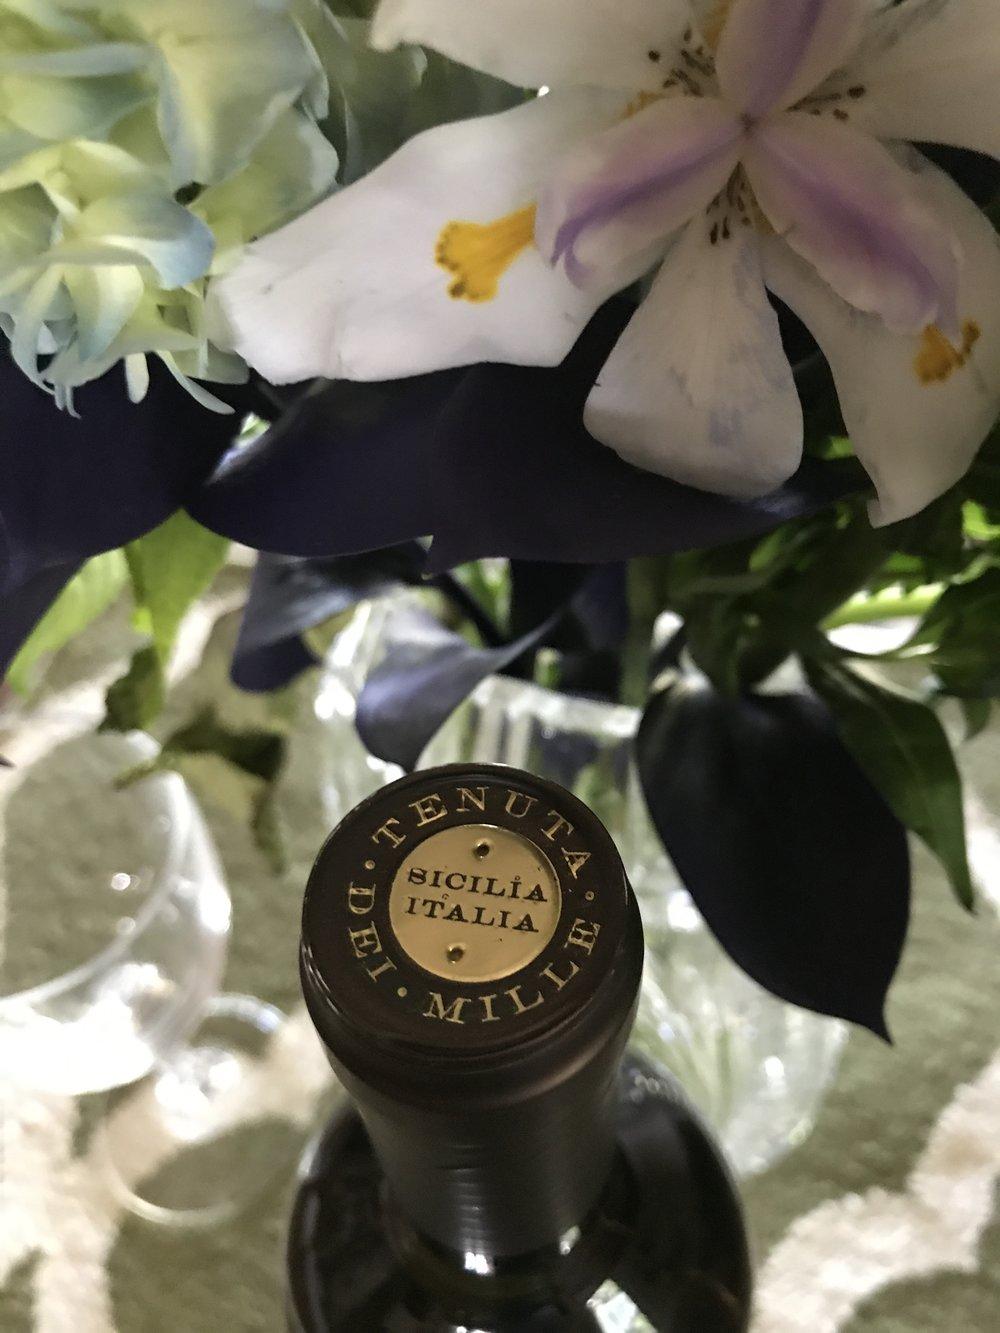 Tenuta Dei Mille wine bottle capsule